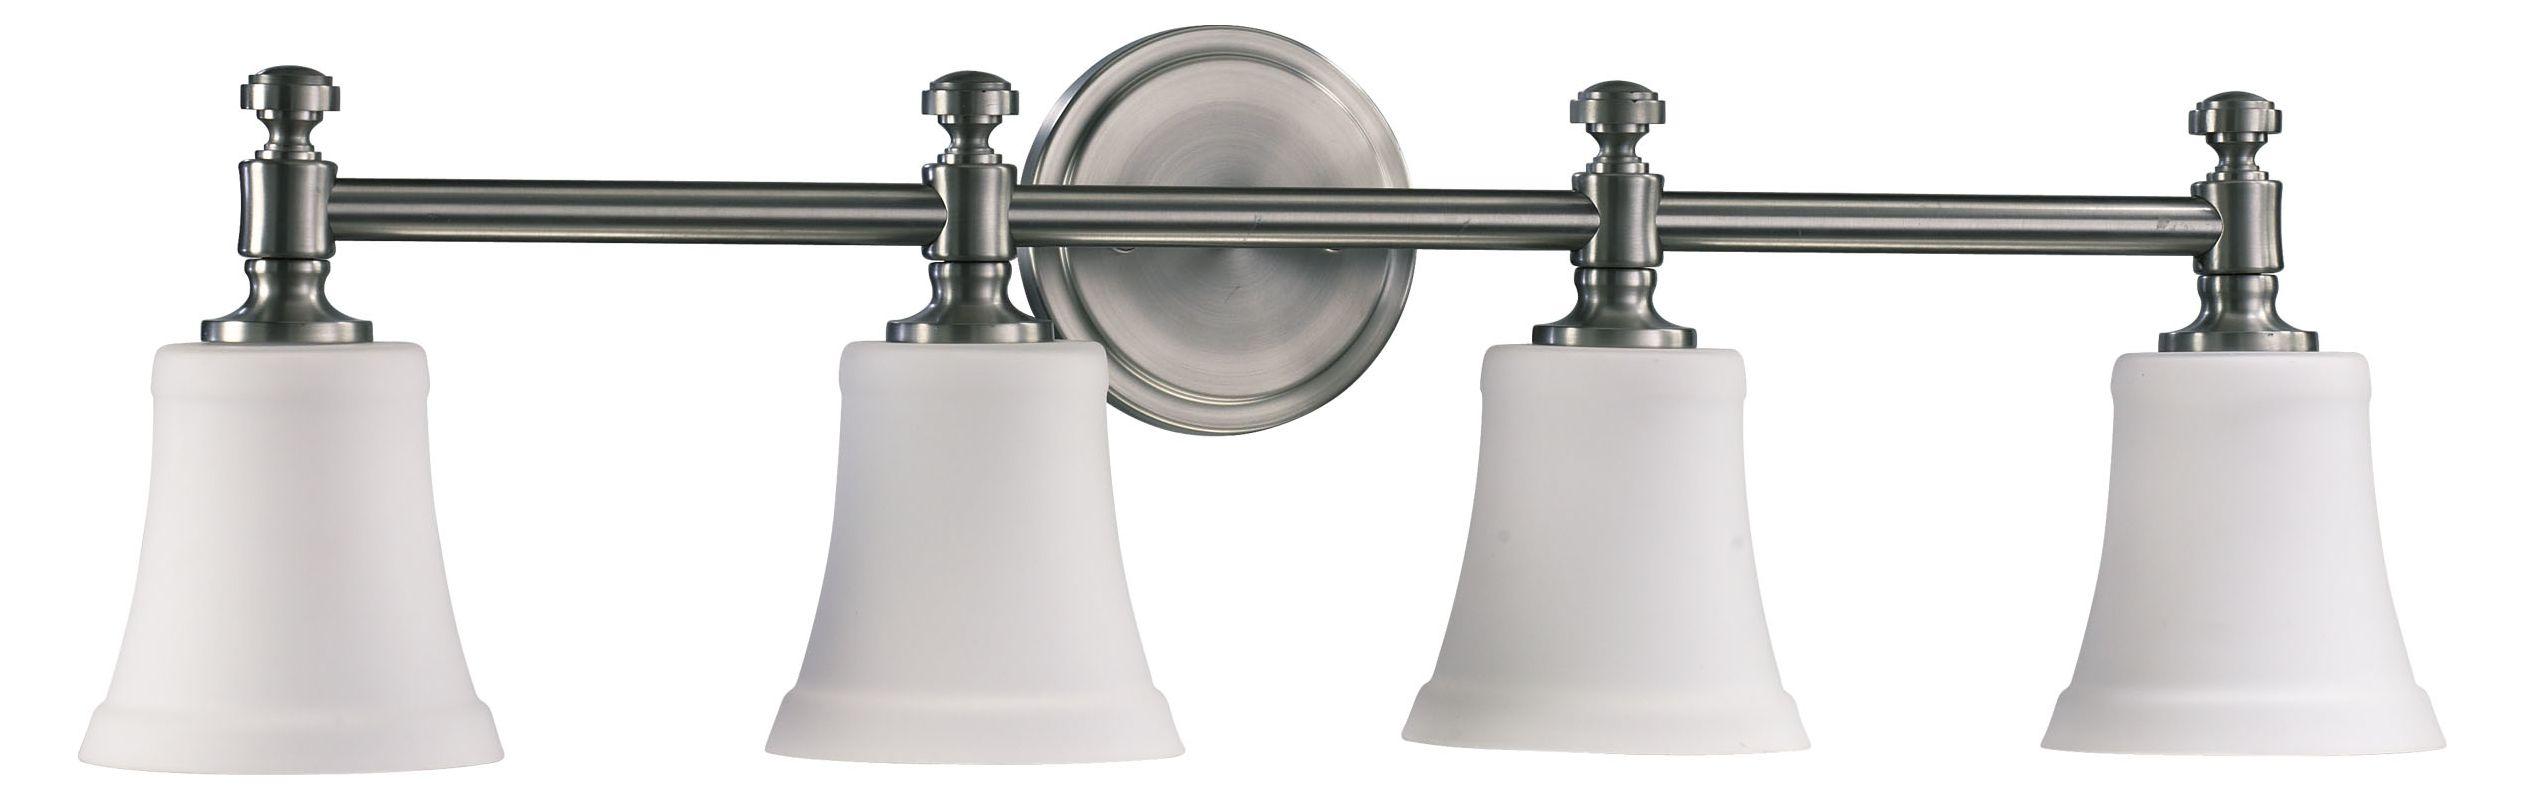 Quorum International 5122-4 4 Light Down Lighting Vanity Light from Sale $159.00 ITEM: bci987566 ID#:5122-4-65 :